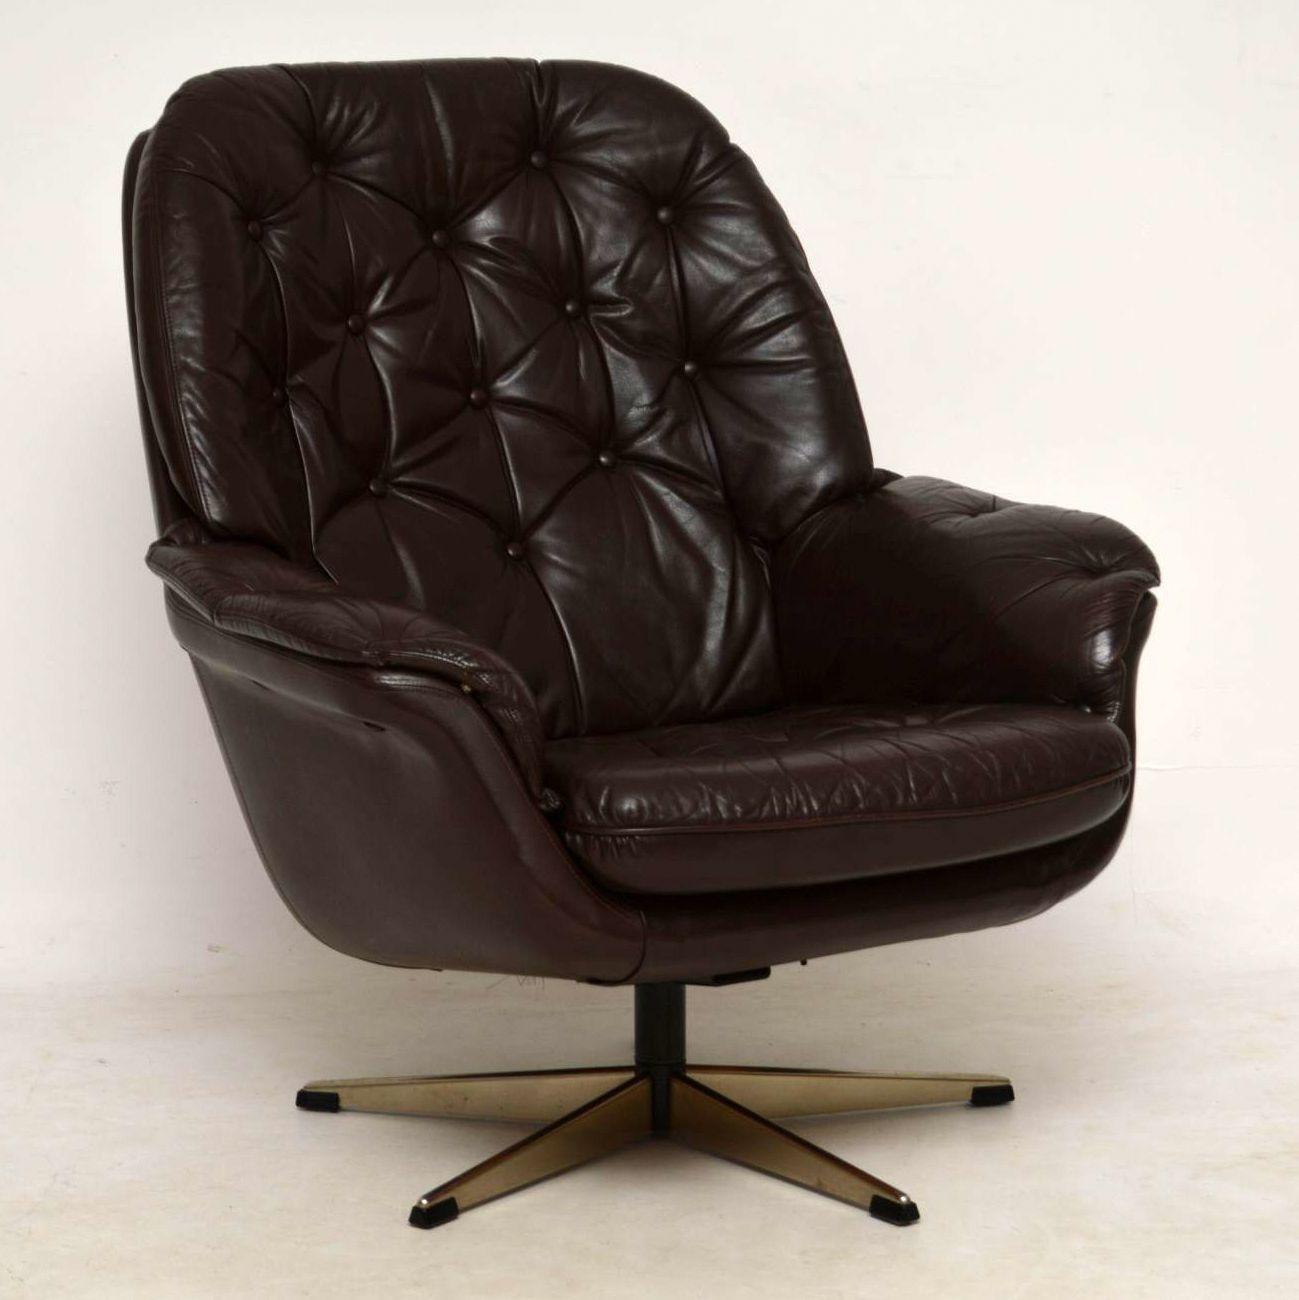 Vintage 70s Leather Swivel Armchair